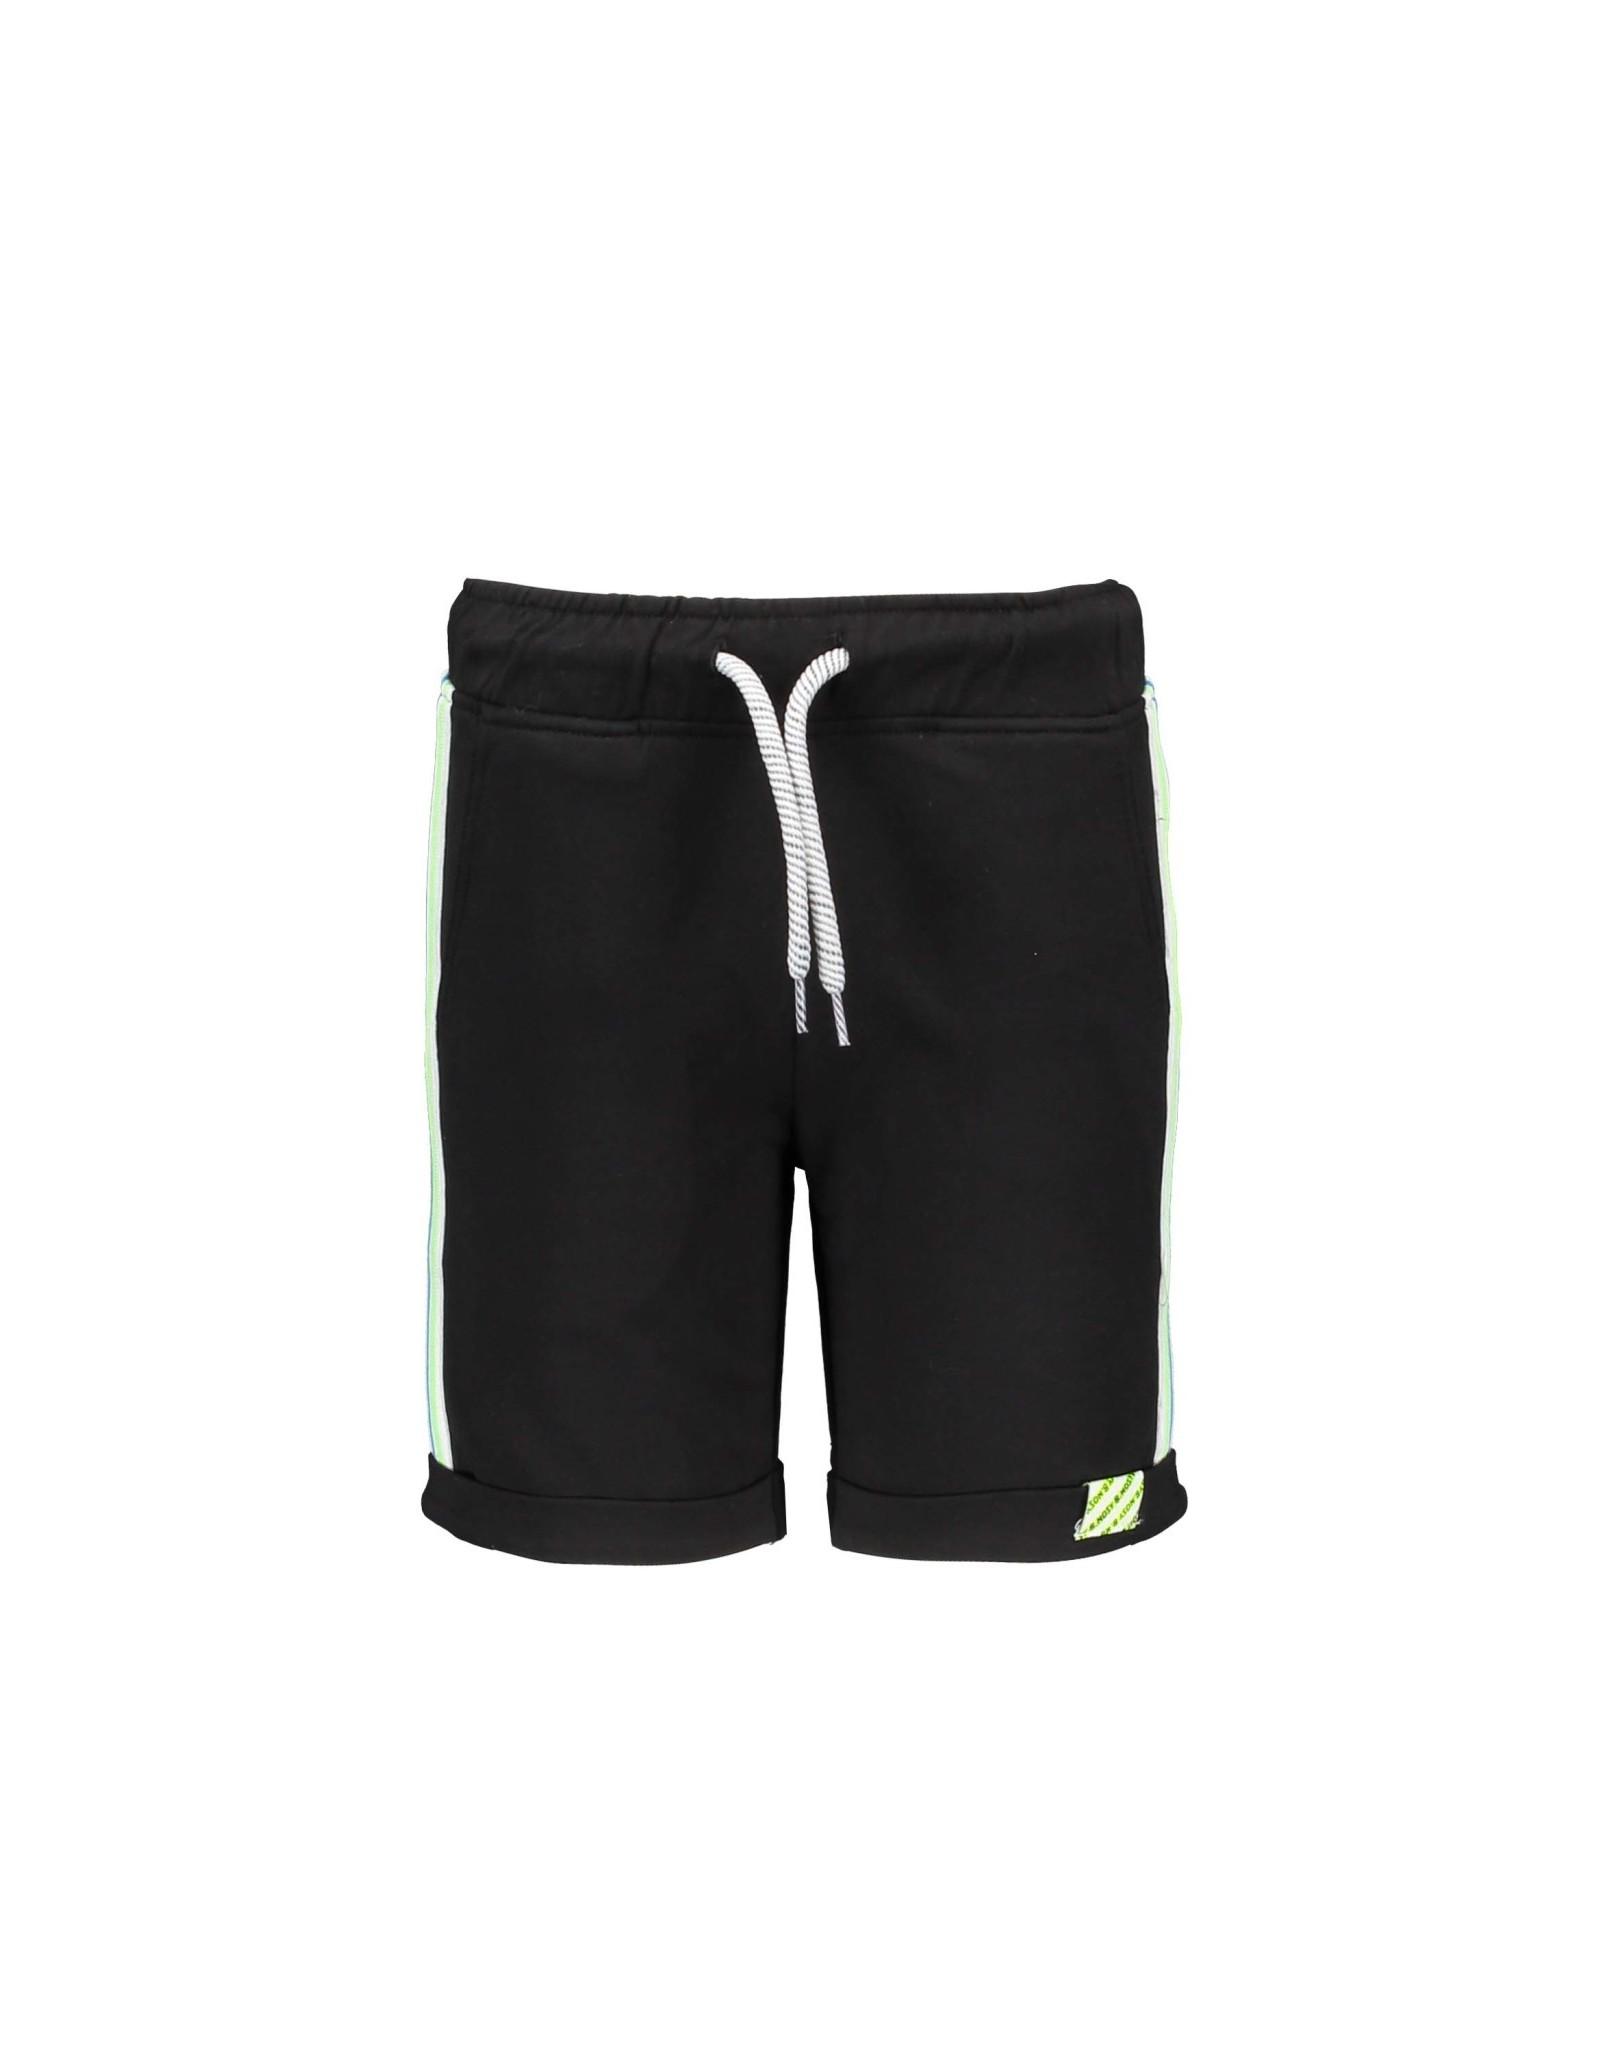 B-nosy Boys sweat shorts with multicolor rib at hem 099 Black